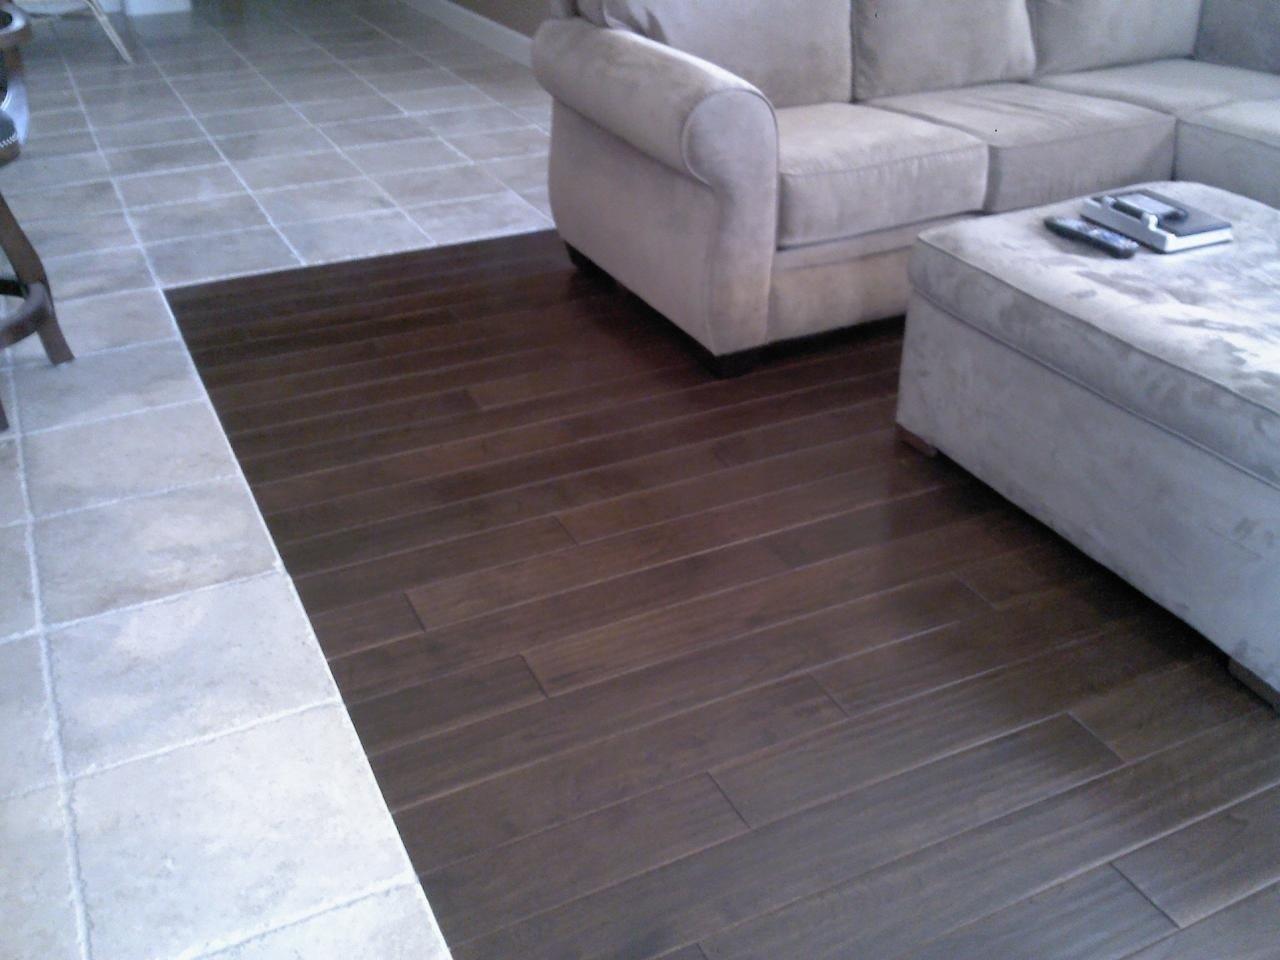 hardwood floor tiles hardwood and tile combination flooring - youtube PWPKTKC